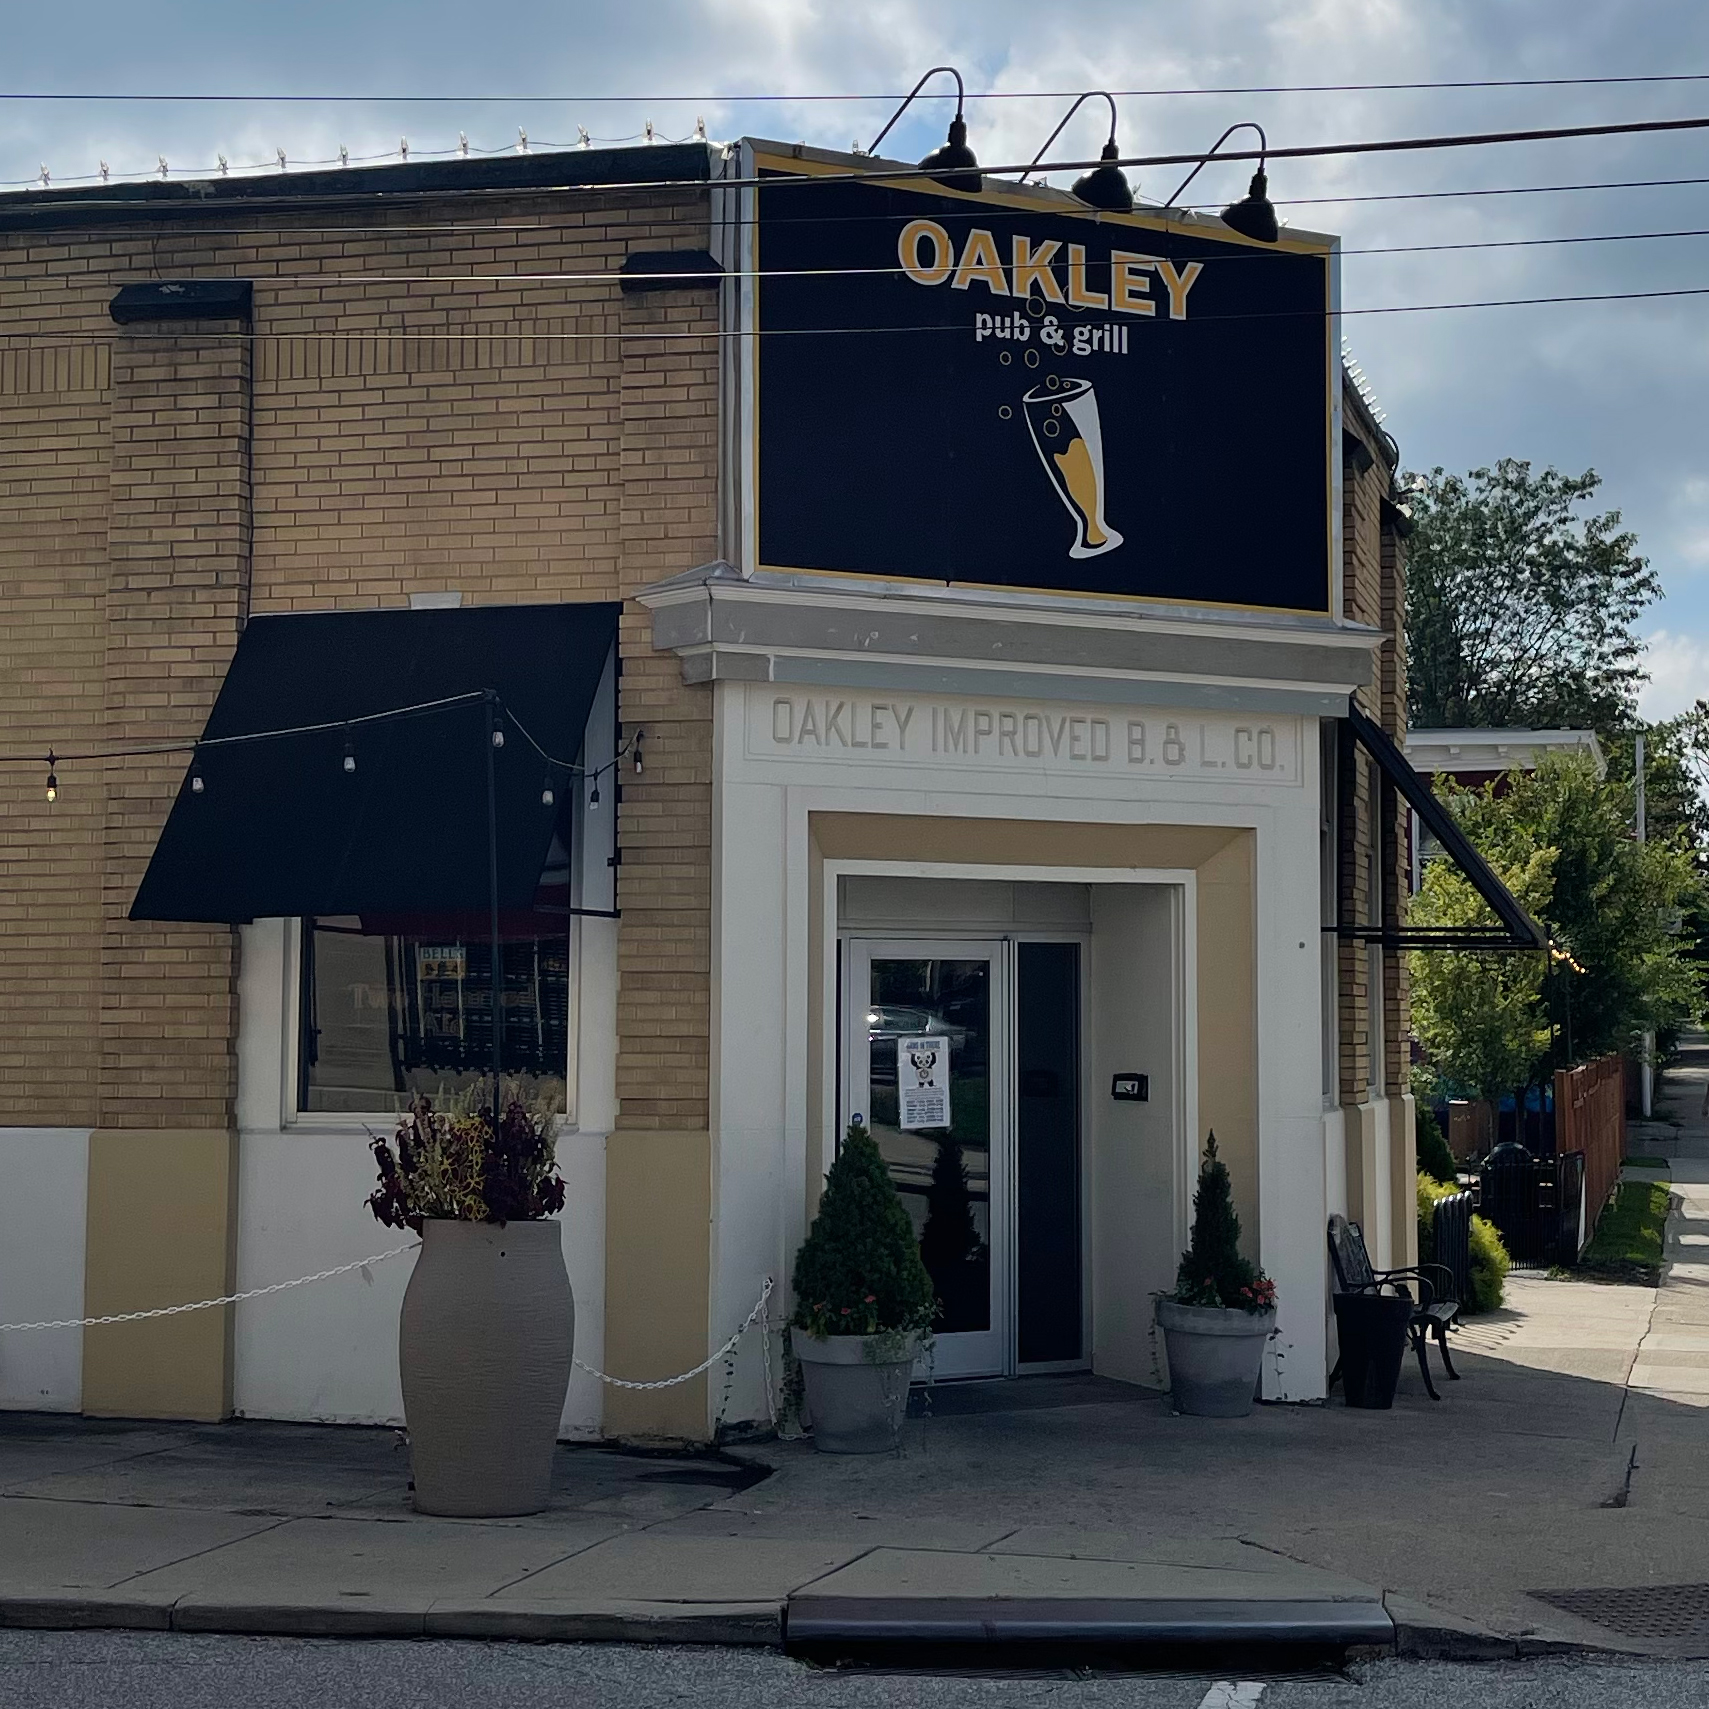 Oakley Pub & Grill